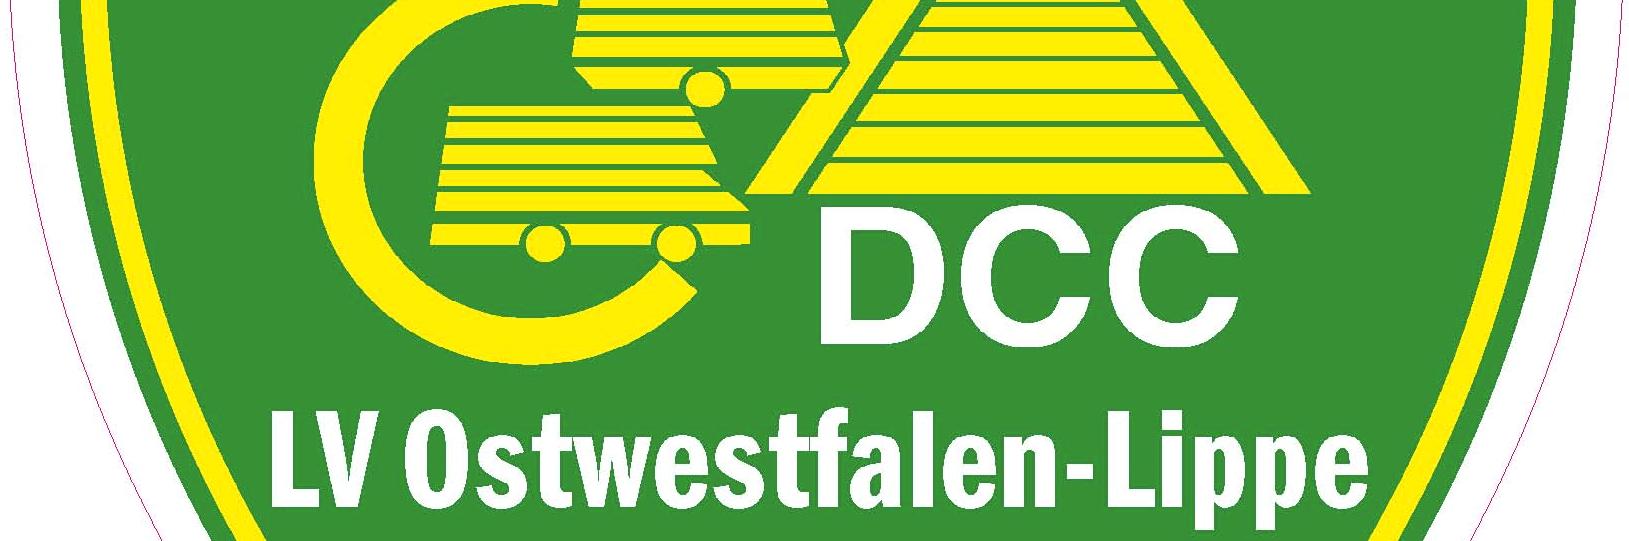 Deutscher Camping-Club Landesverband Ostwestfalen-Lippe e.V.